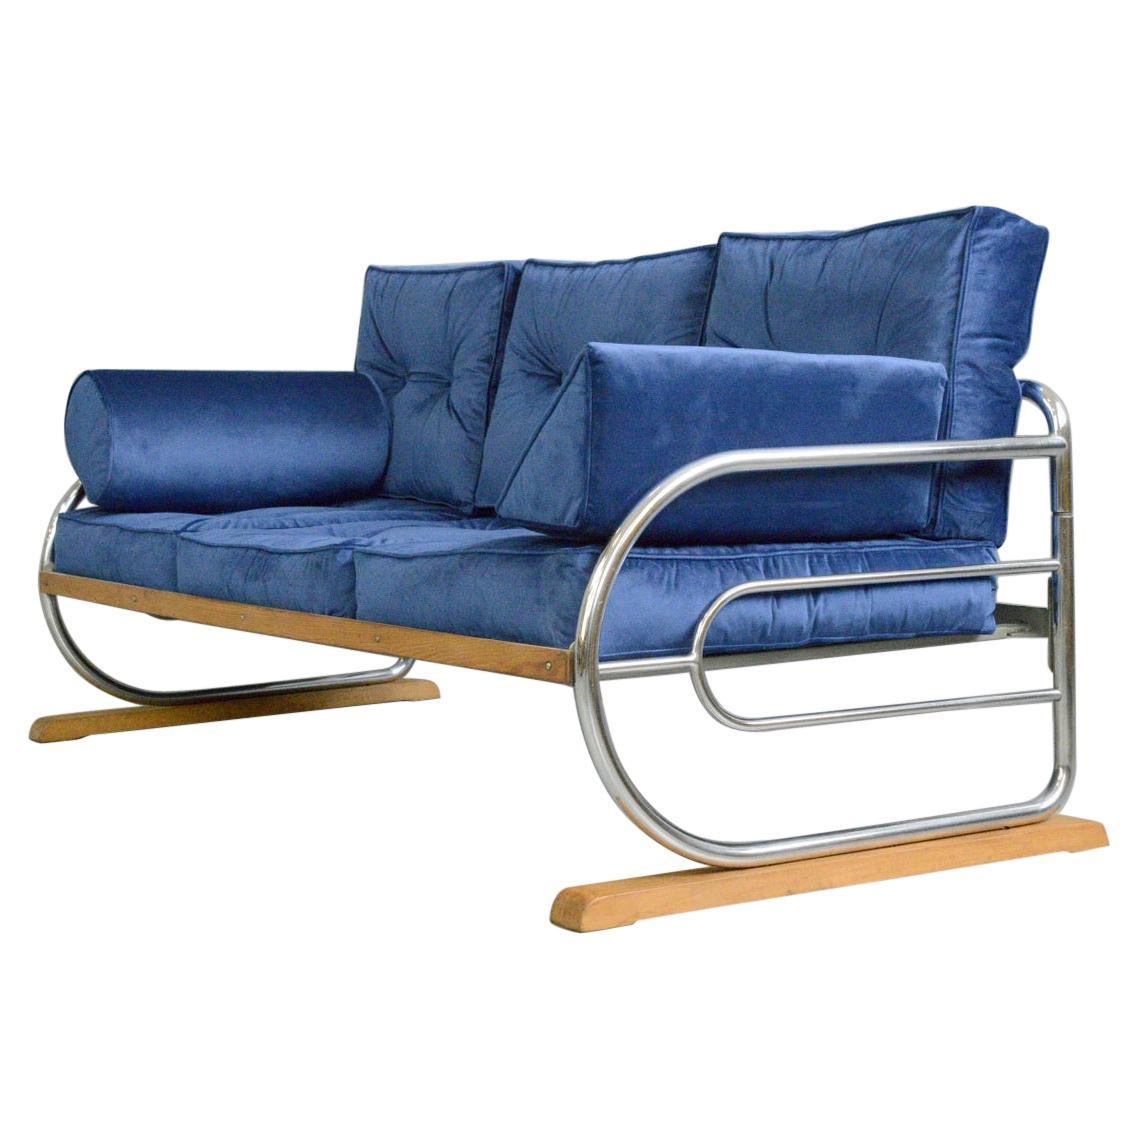 Bauhaus Sofa by Hynek Gottwald, Circa 1930s